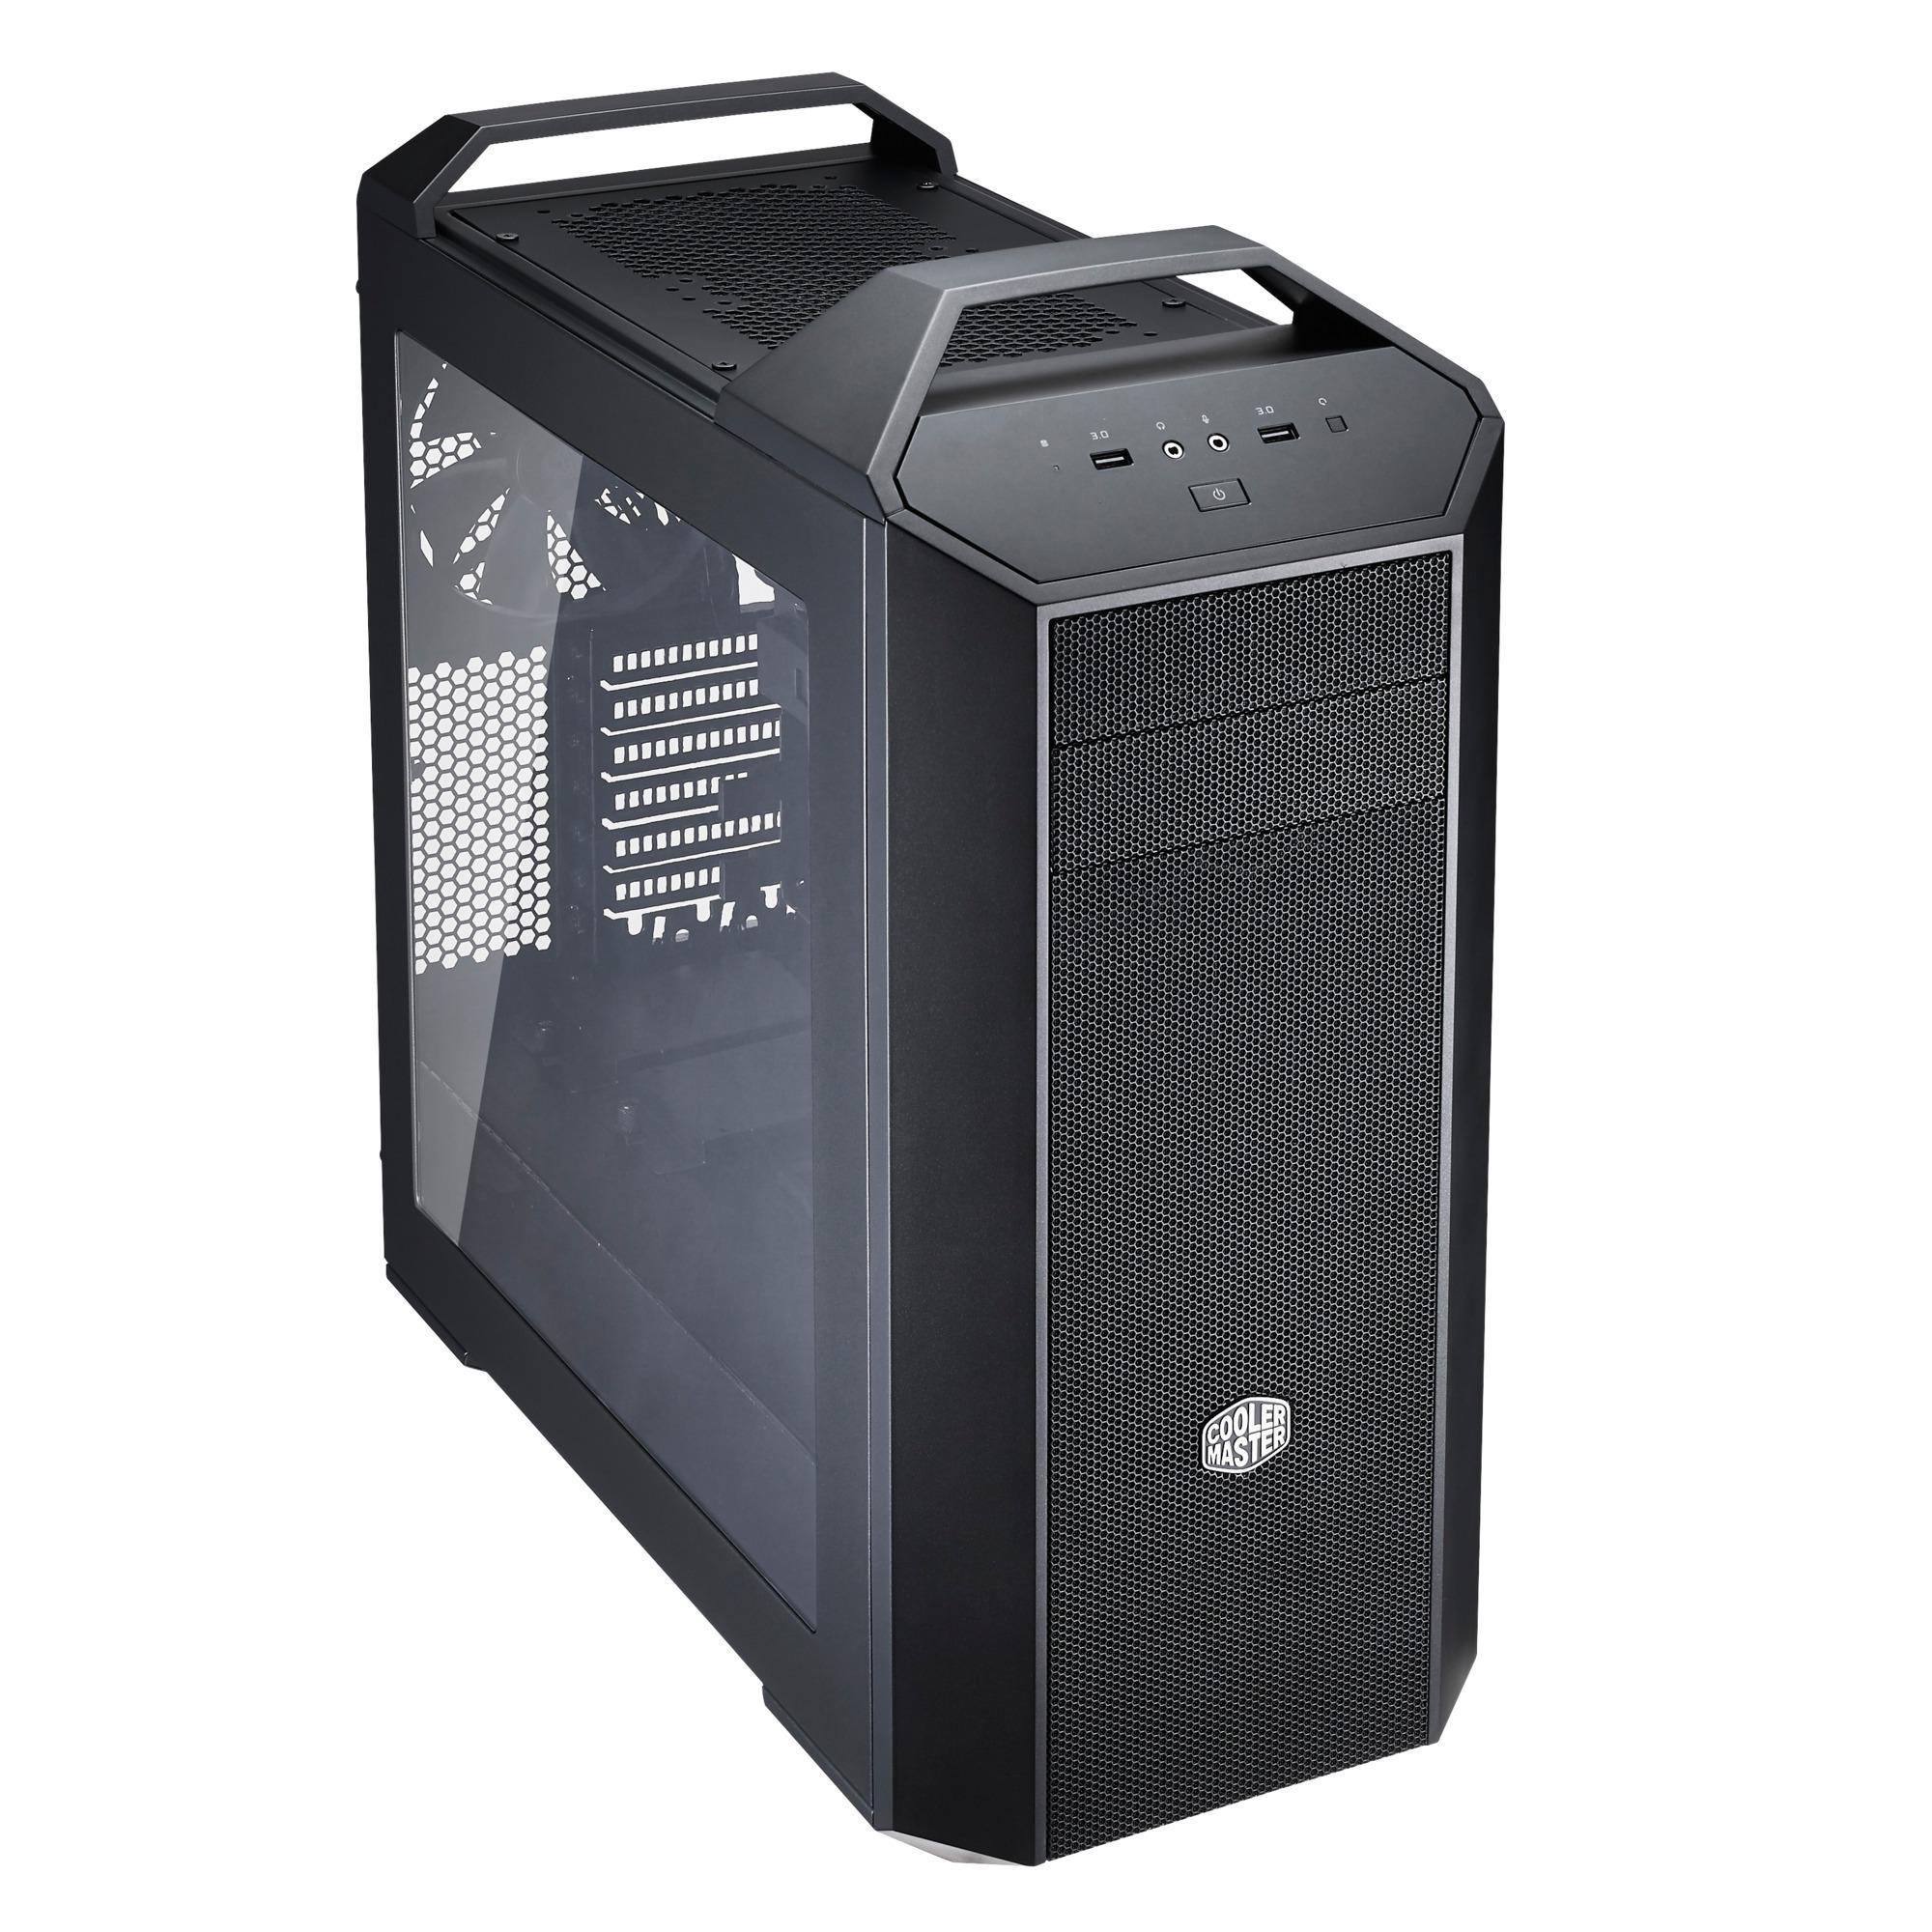 master-case-5-towerkabinet